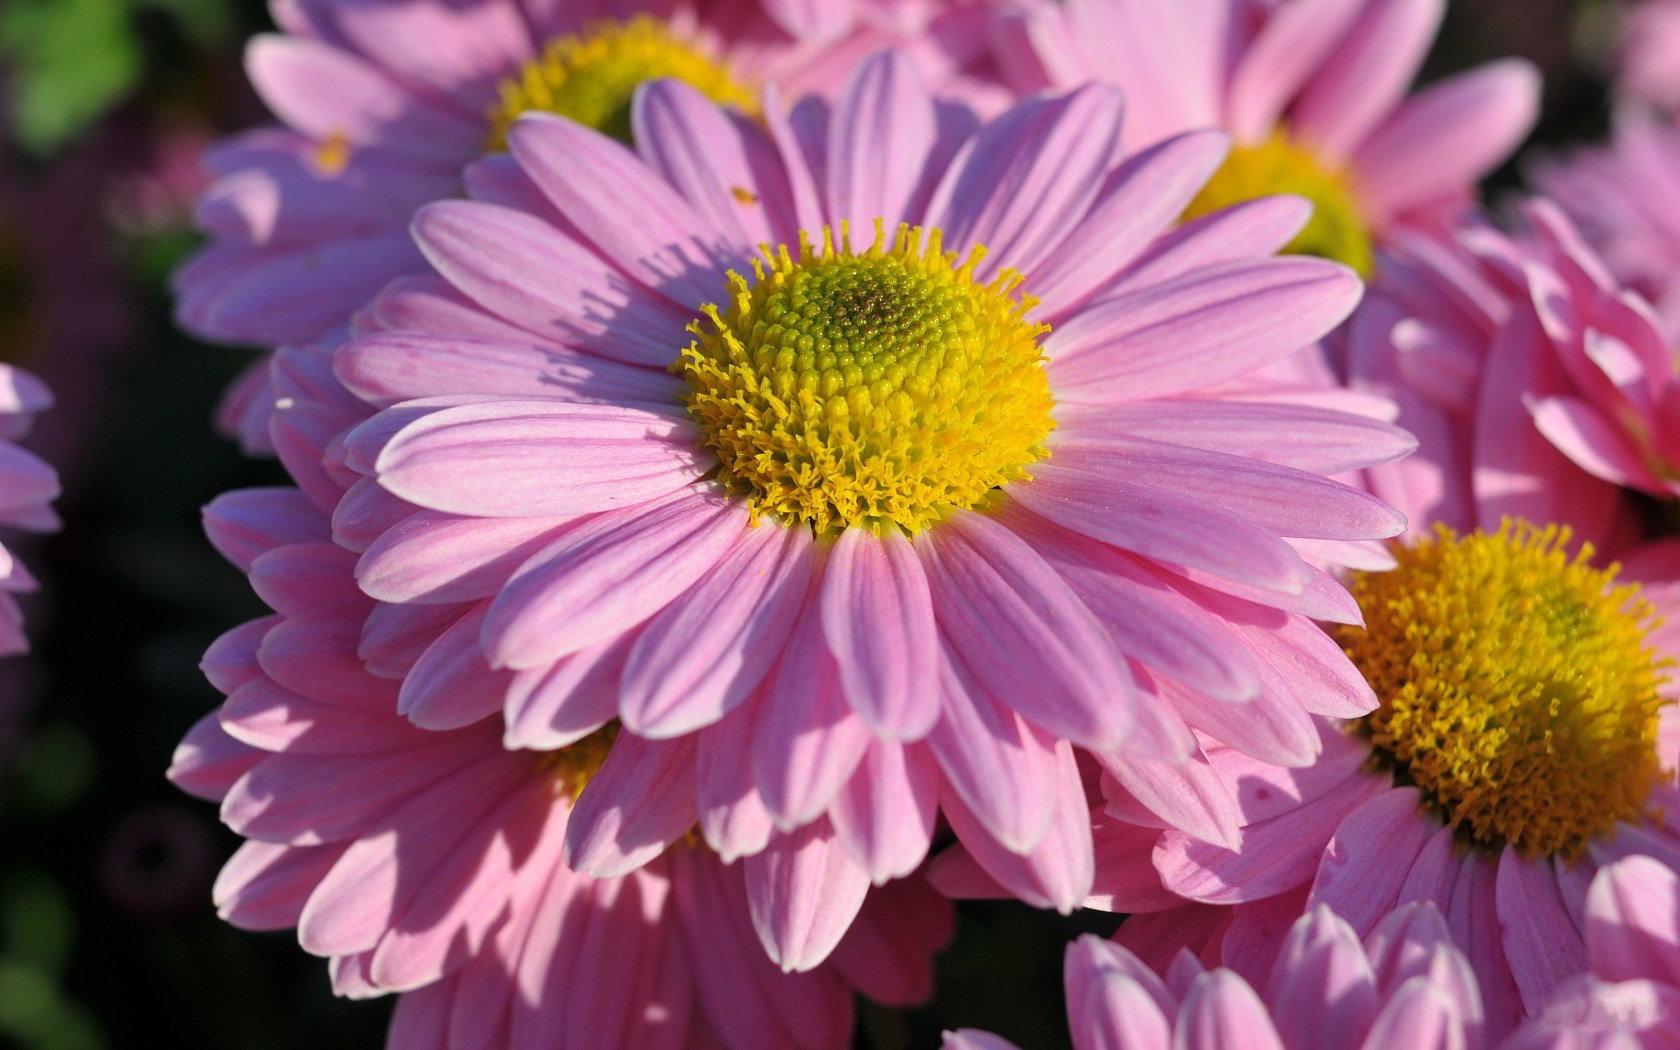 hinh anh hoa cuc dep 46